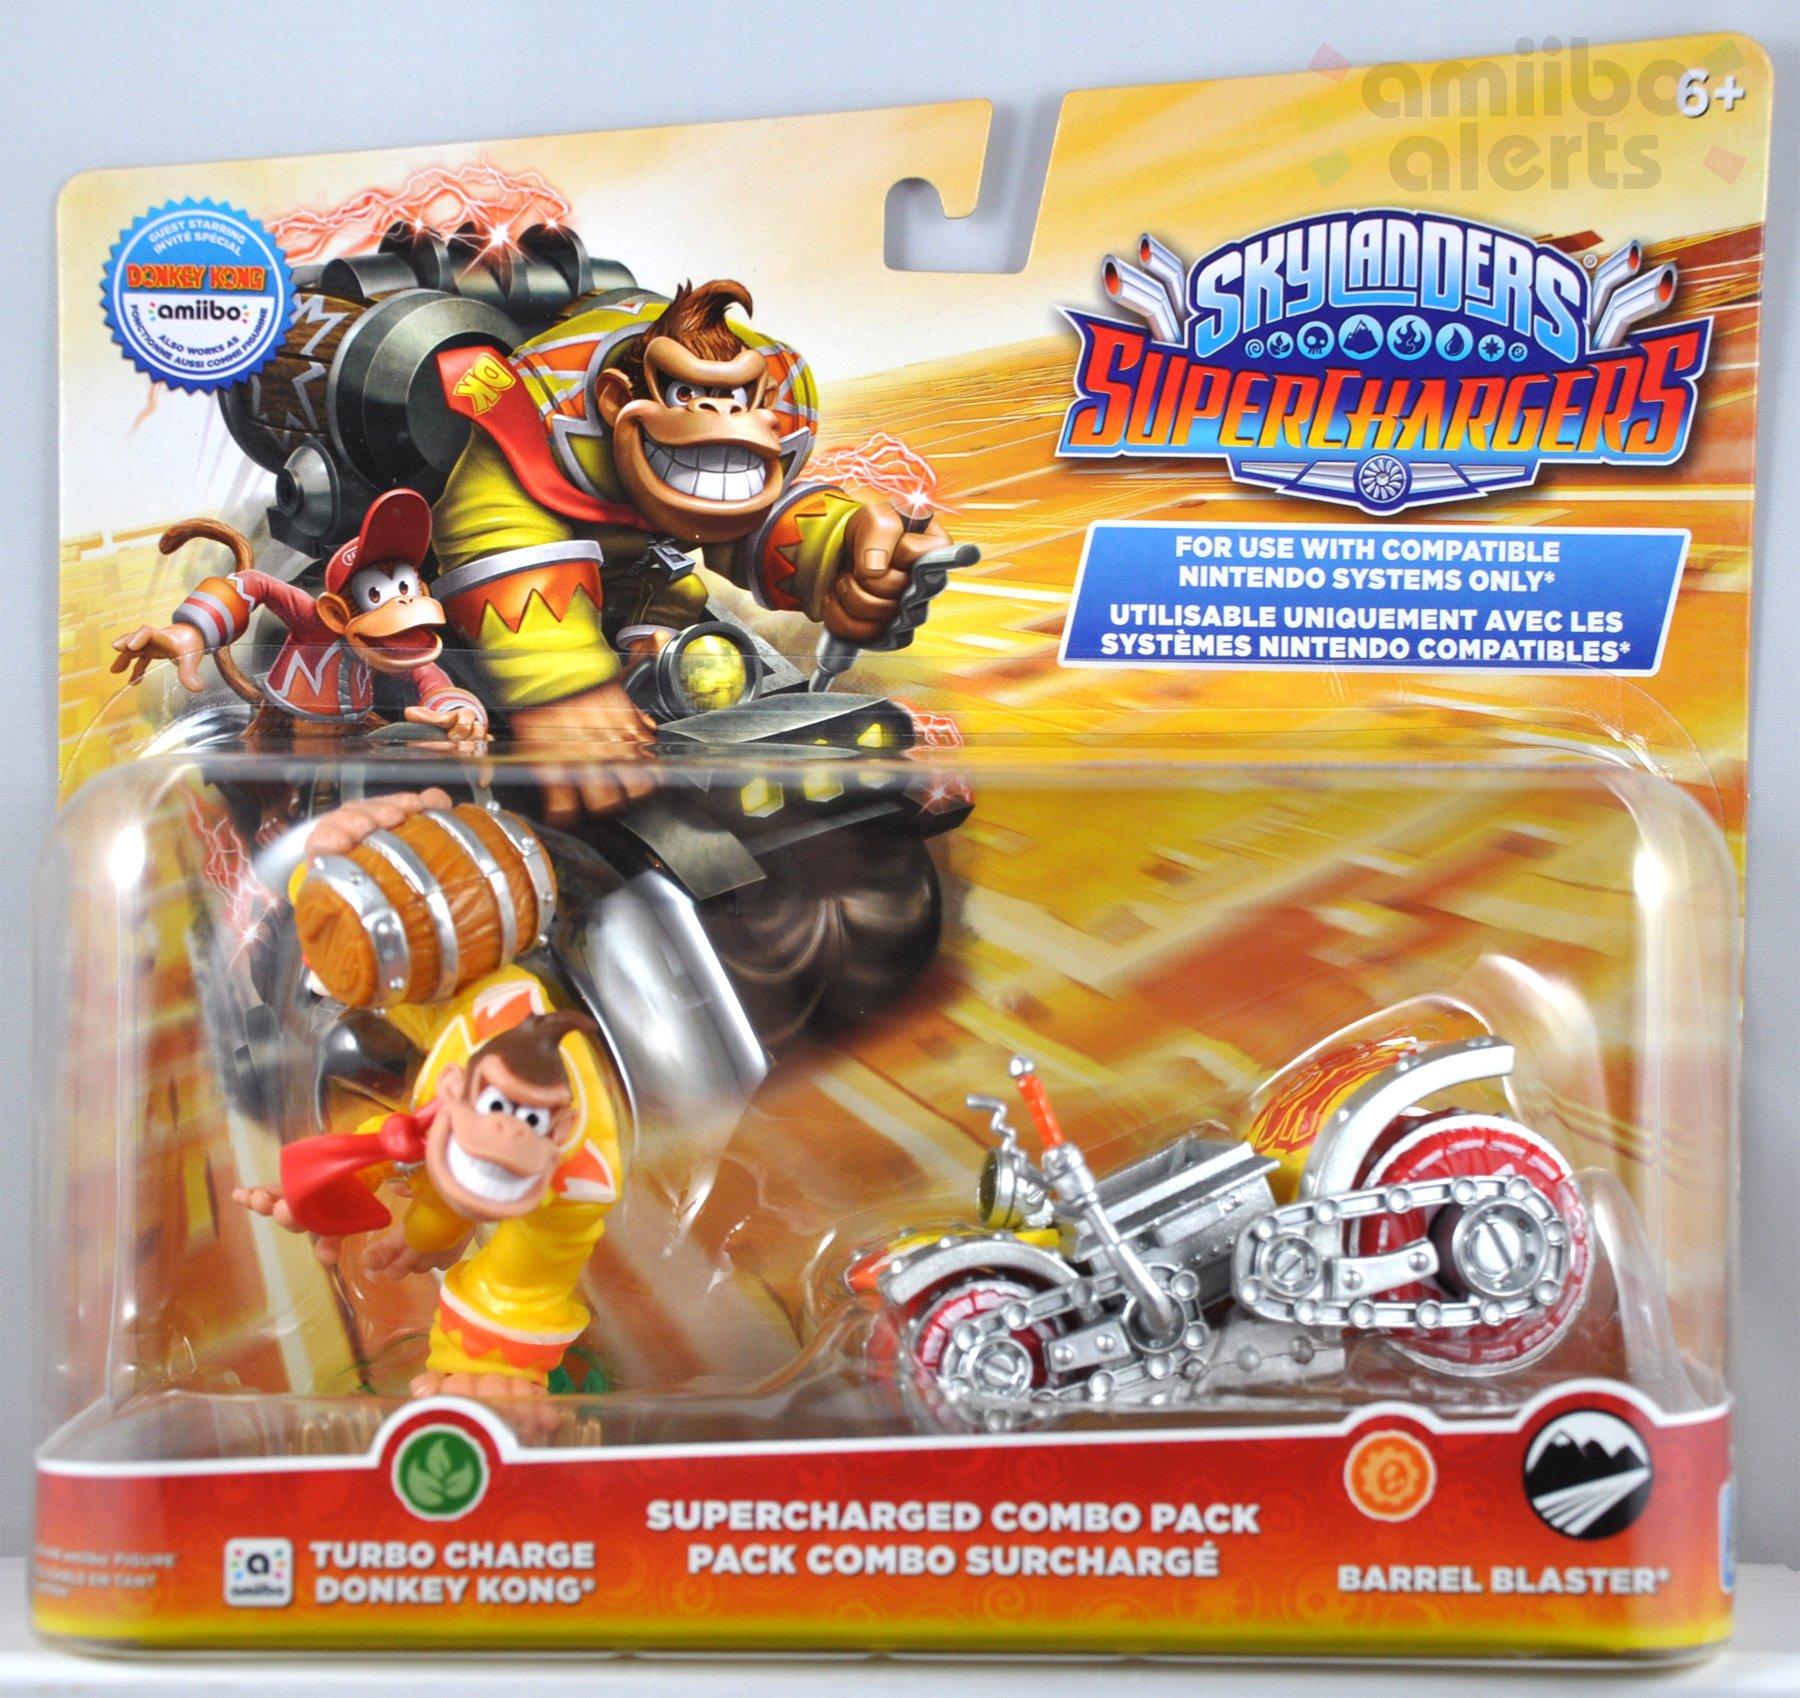 Turbo Charge Donkey Kong Skylanders Superchargers Amiibo Figure 3DS Wii WiiU